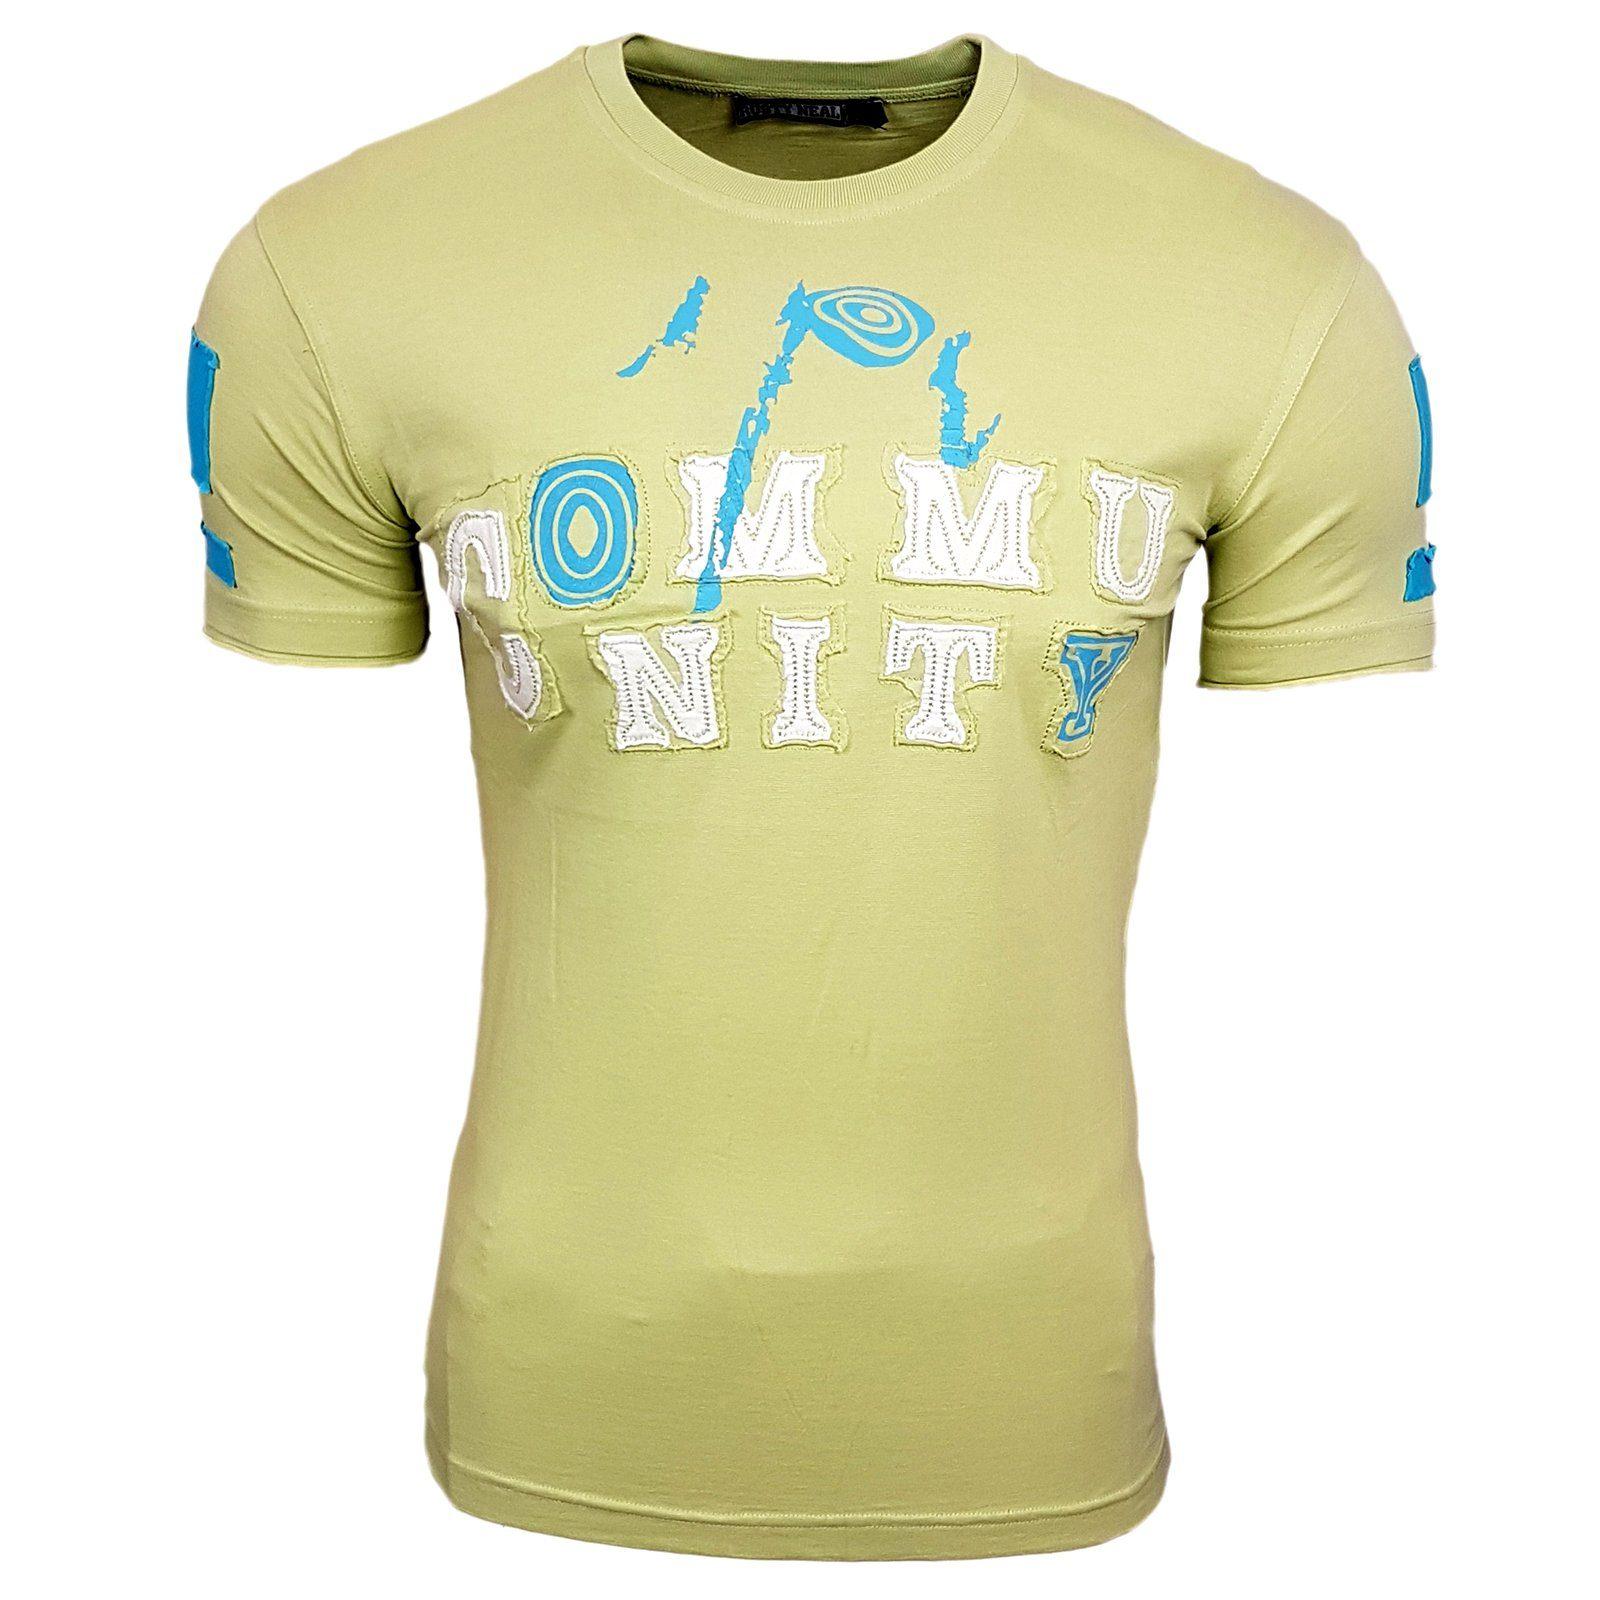 Weitere Ballsportarten Spalding Crossover Shooting Shirt Basketball Trikot Grün Professionelles Design Sport